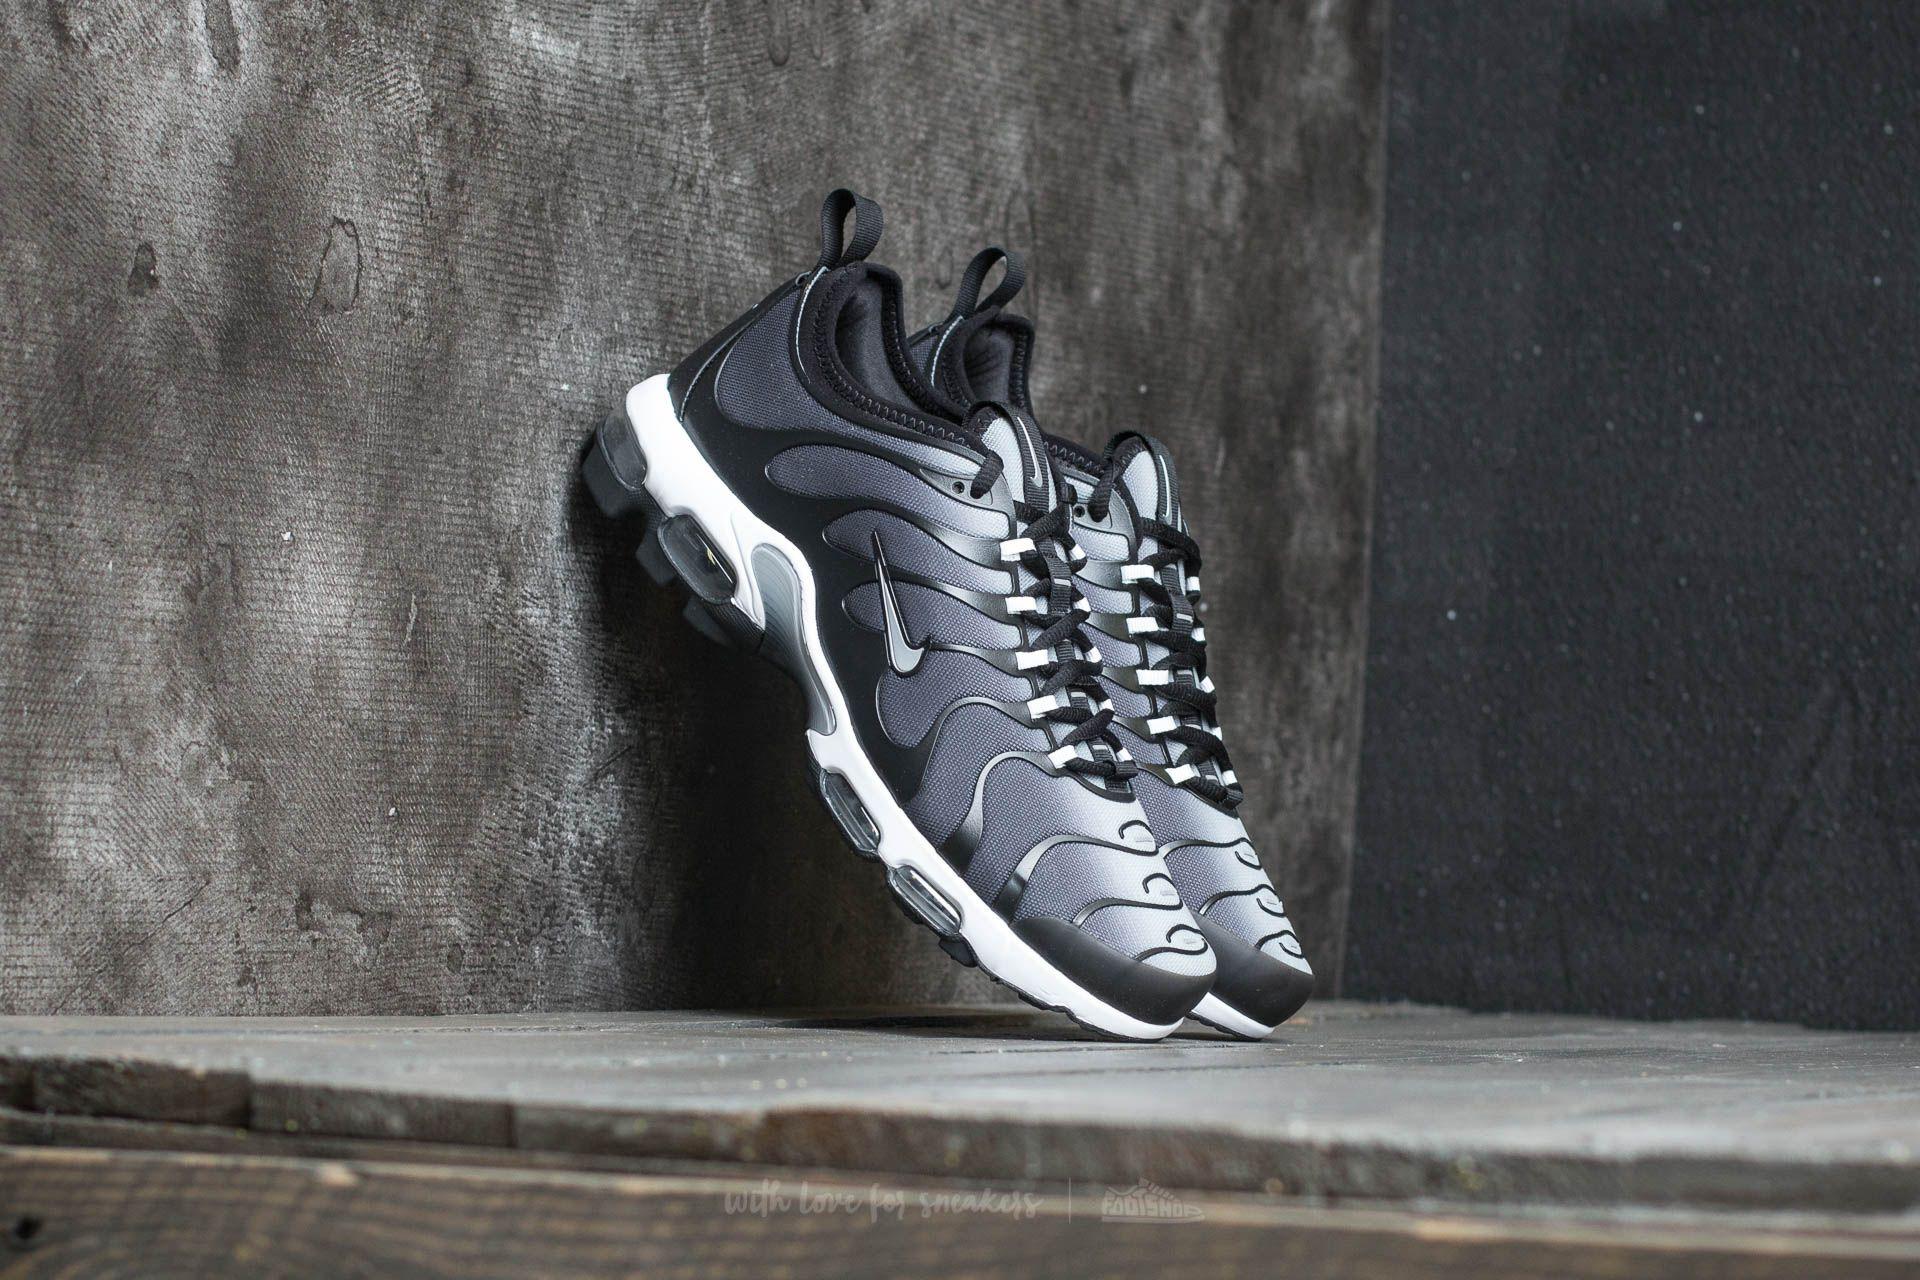 Nike Air Max Plus TN Ultra Black/ Metallic Silver